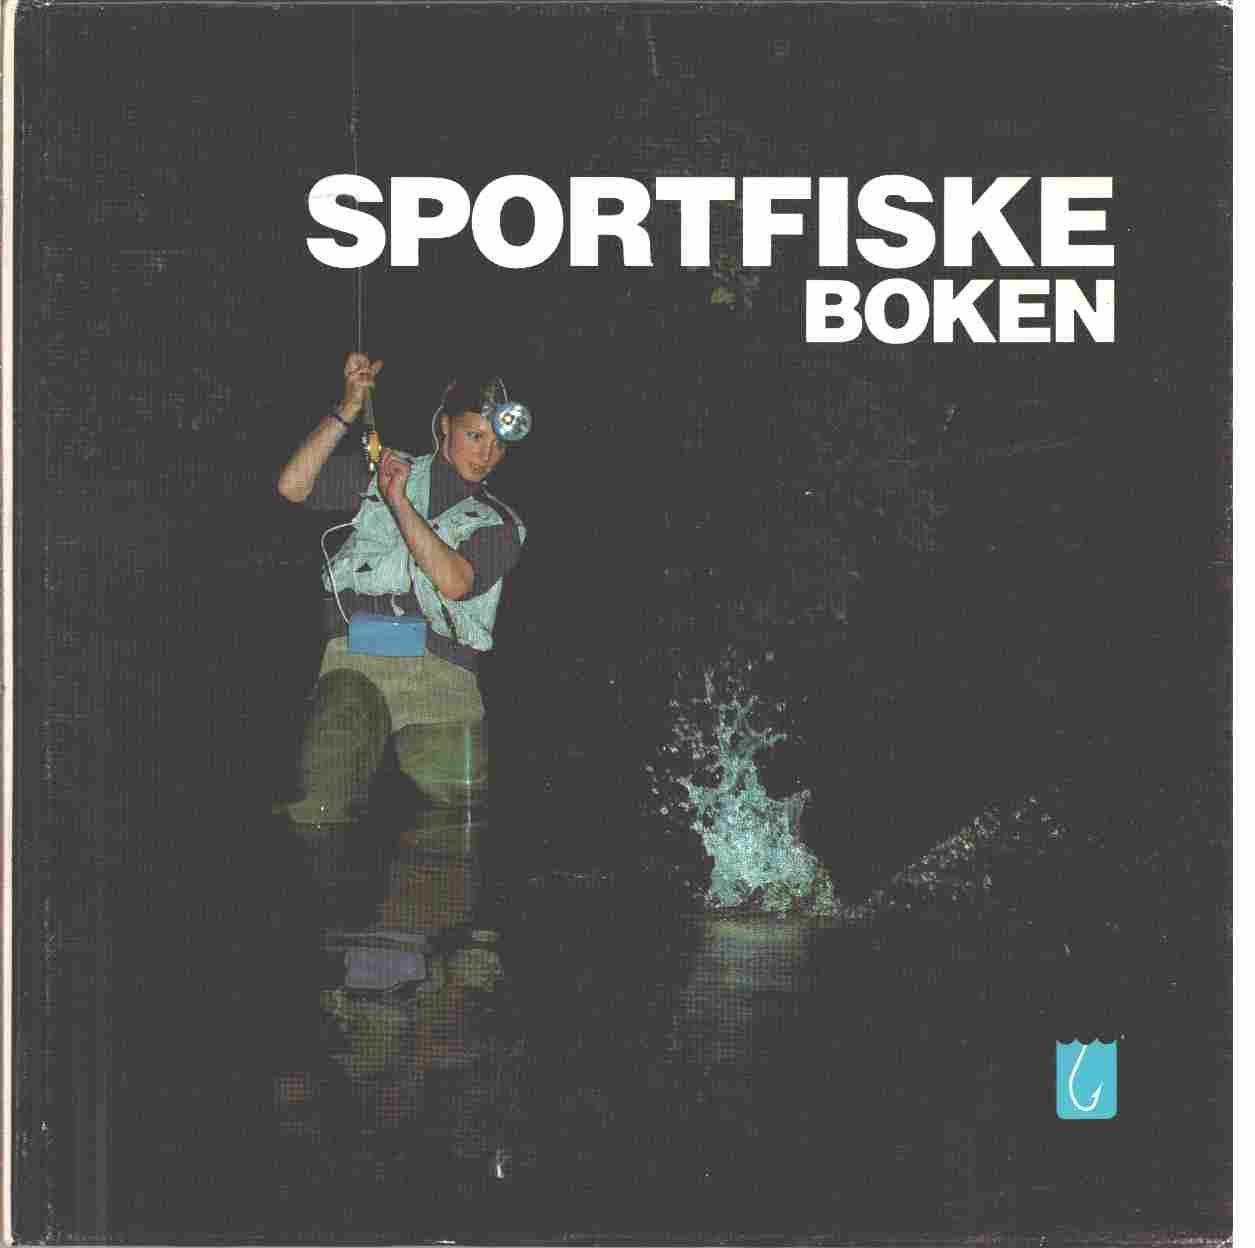 Sportfiskeboken - Bergfors, Olle och Runnström, Hans samt Nilsson, Olle W